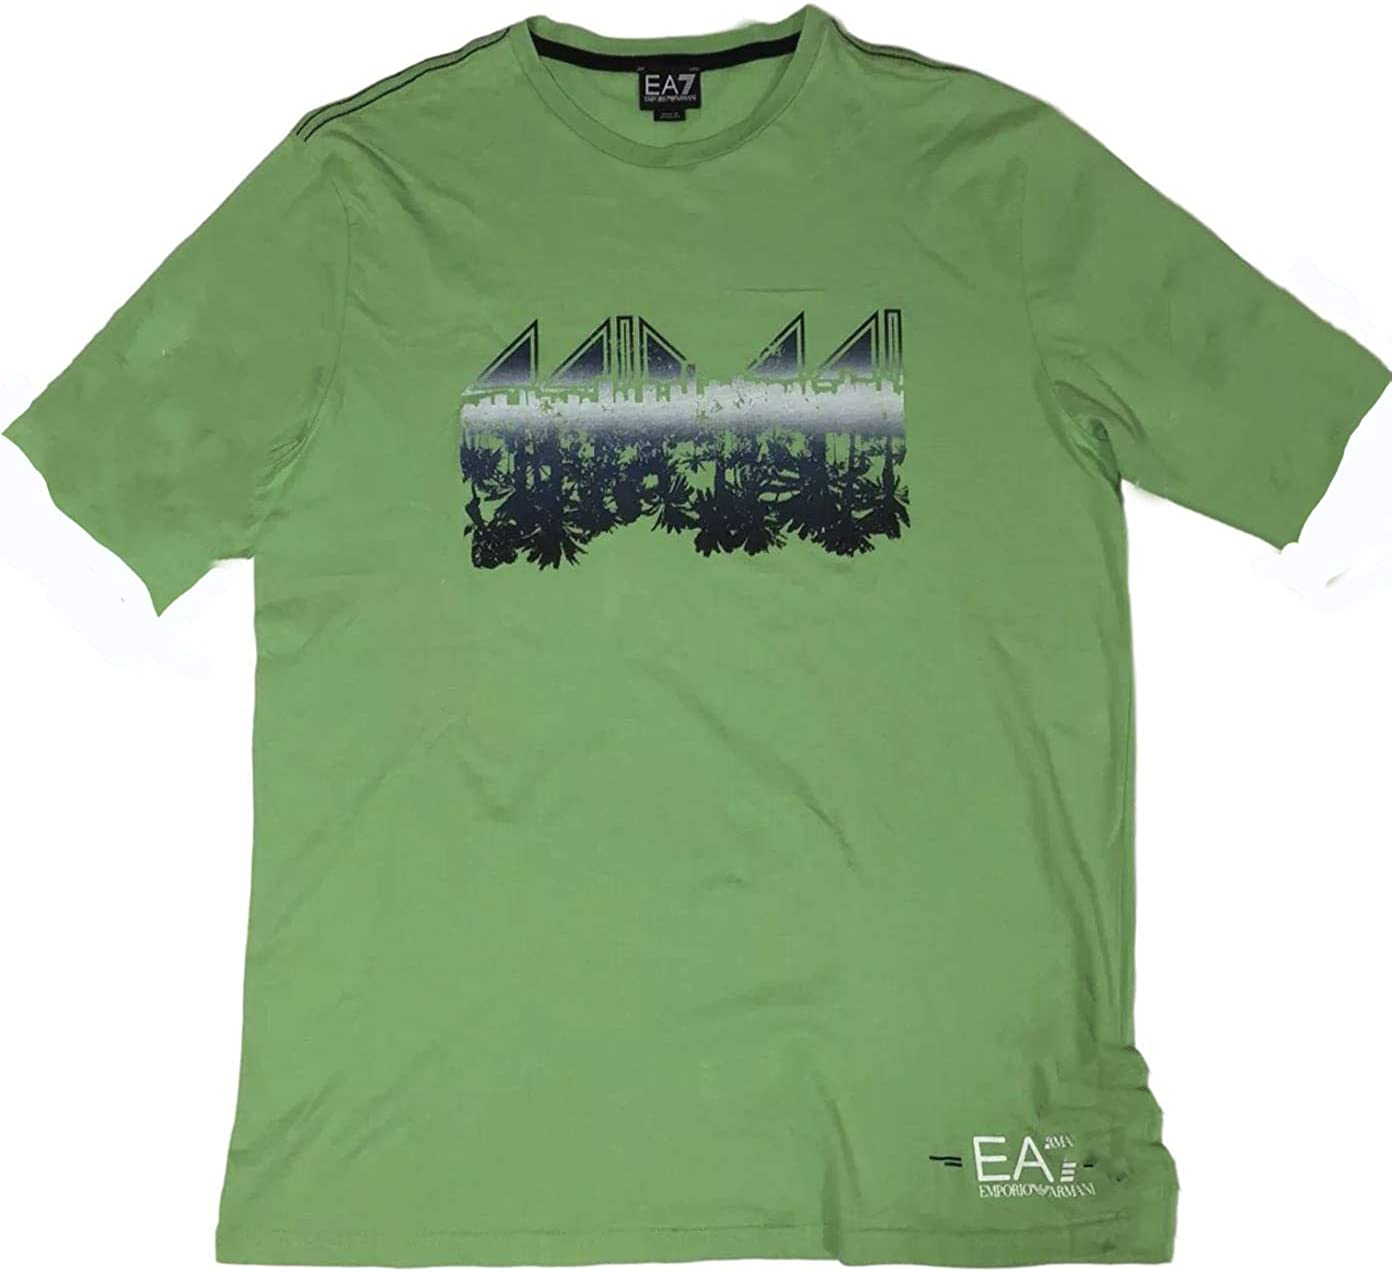 EA7 Men's Avocado Max 48% OFF Green Max 70% OFF SEA World Graphic S T-Shirt XL Frisbee